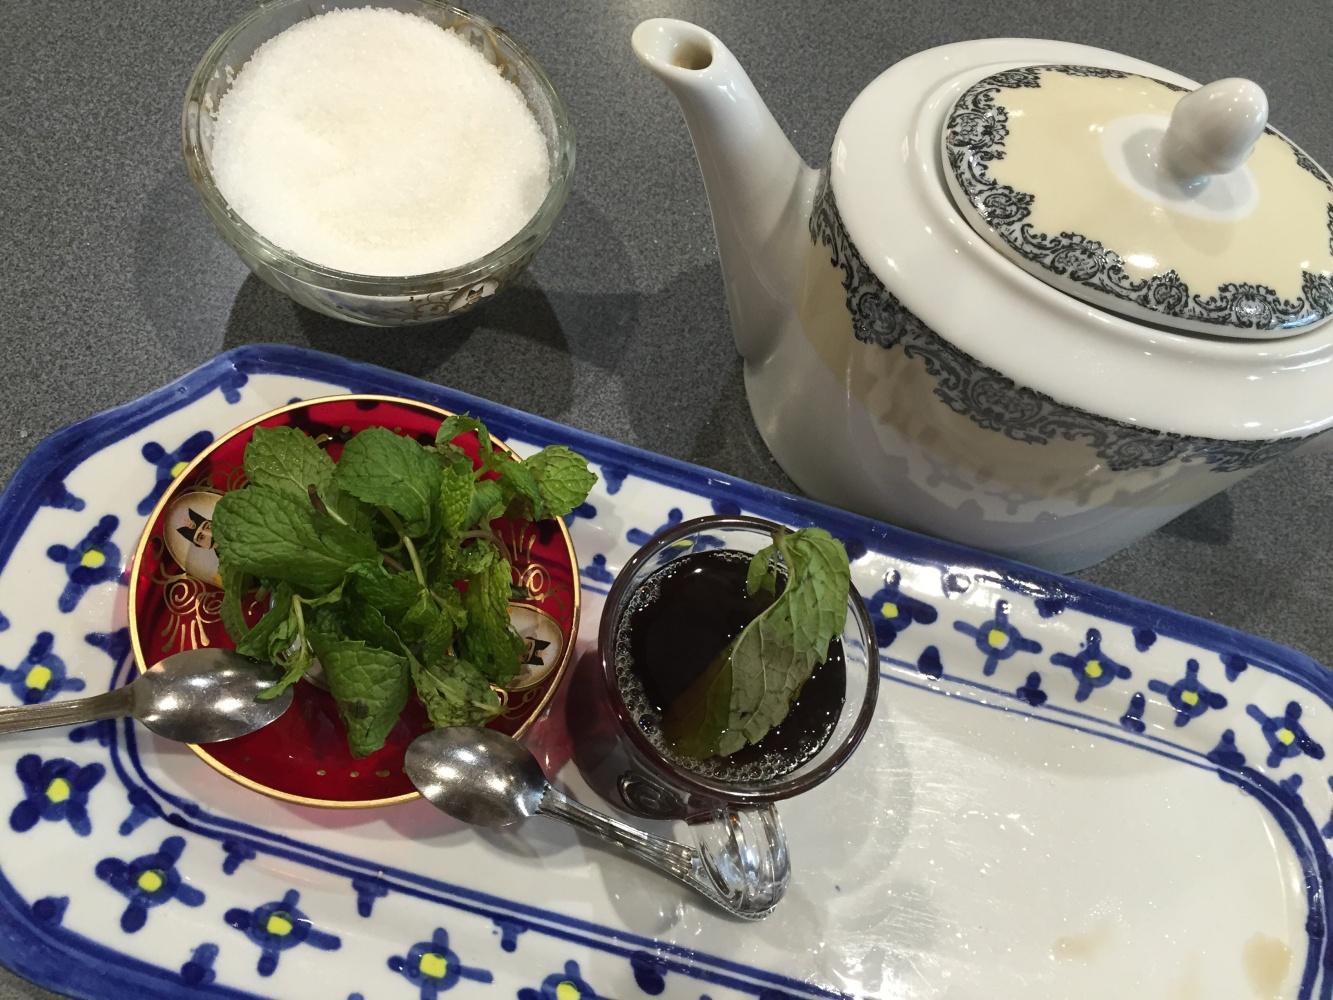 Tea at persain garden restaurant @ Persian Garden Restaurant - Bahrain